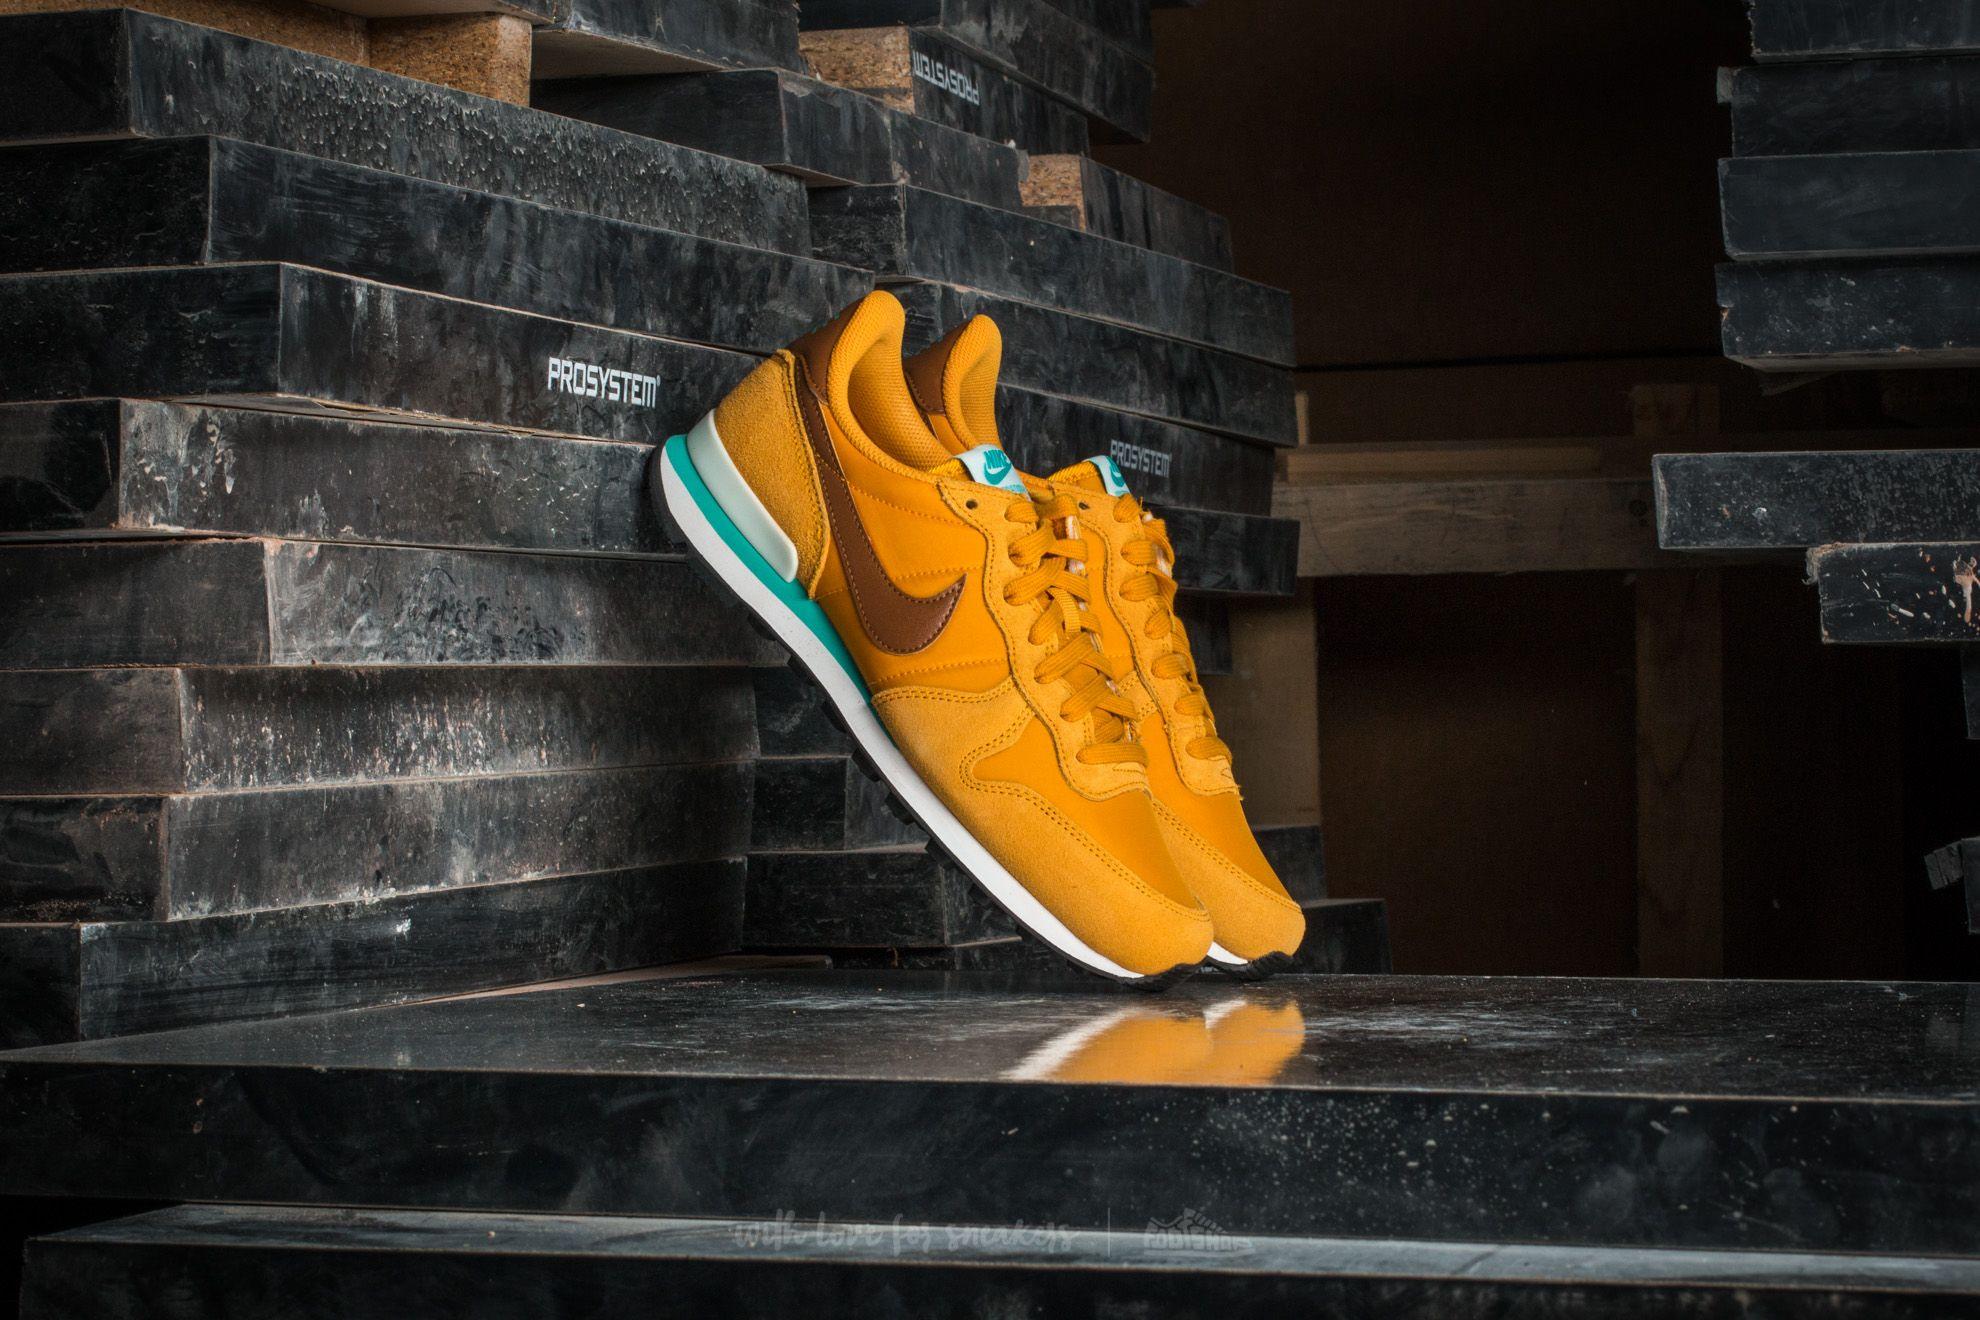 Nike Wmns Internationalist Gold Leaf/ Hazelnut-Barely Gree